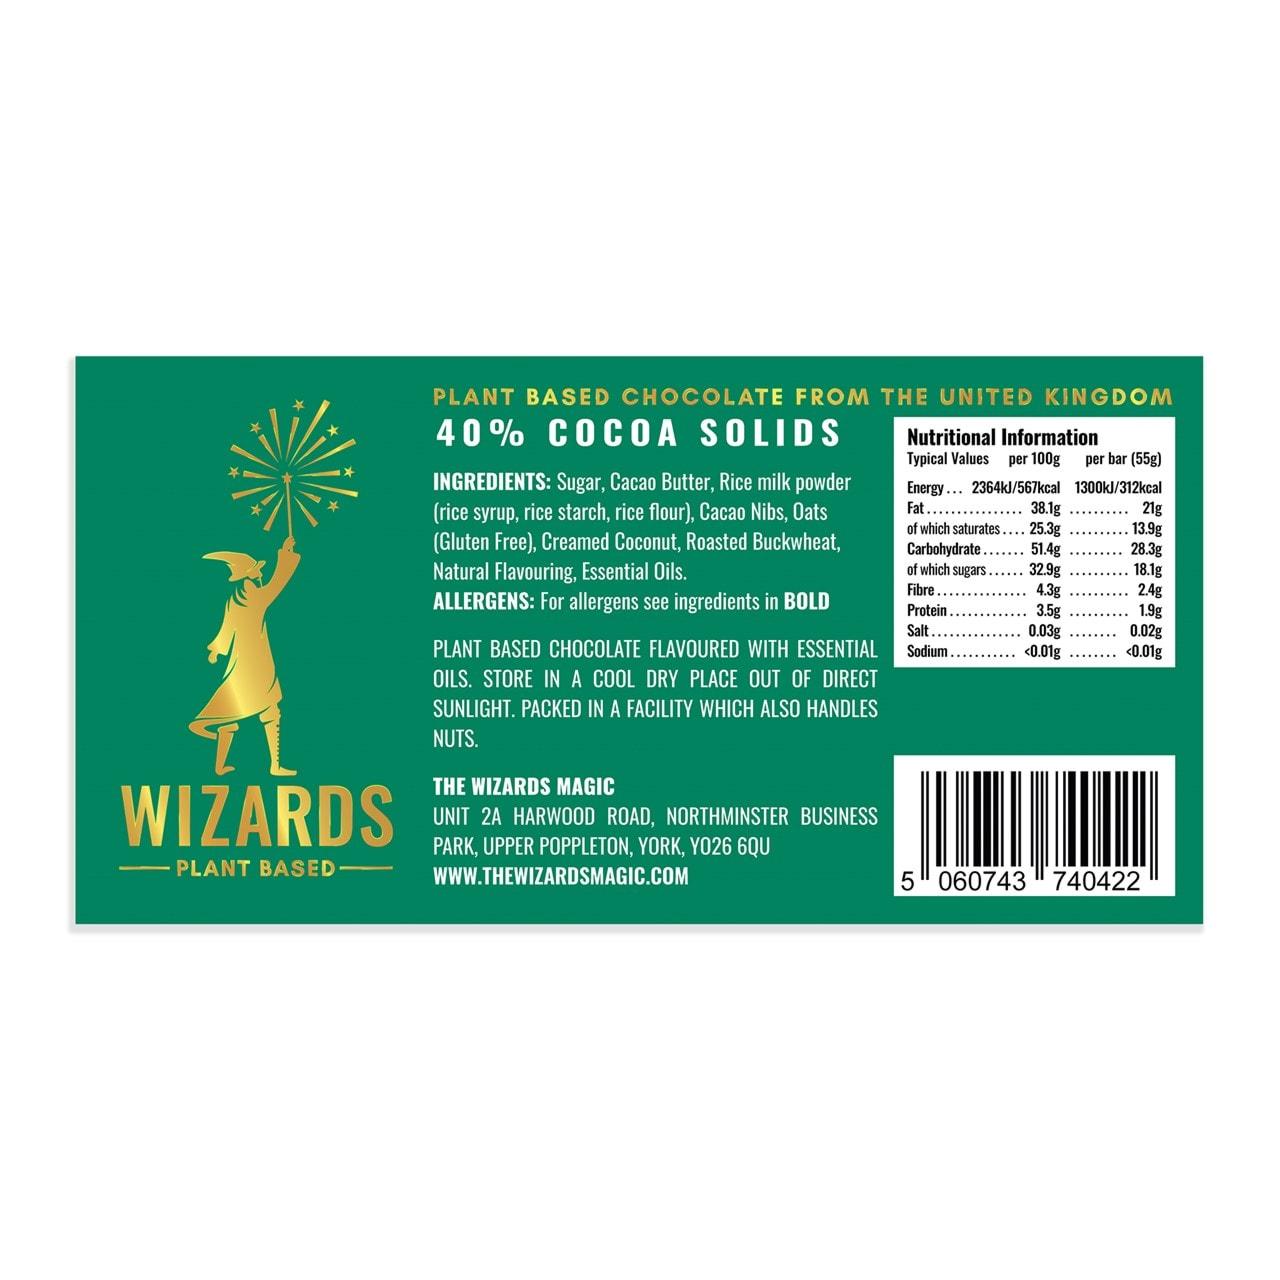 Wizards Magic Chocolate: Plant Based Gift Pack: Orange & Vanilla (Pack of 4) - 2